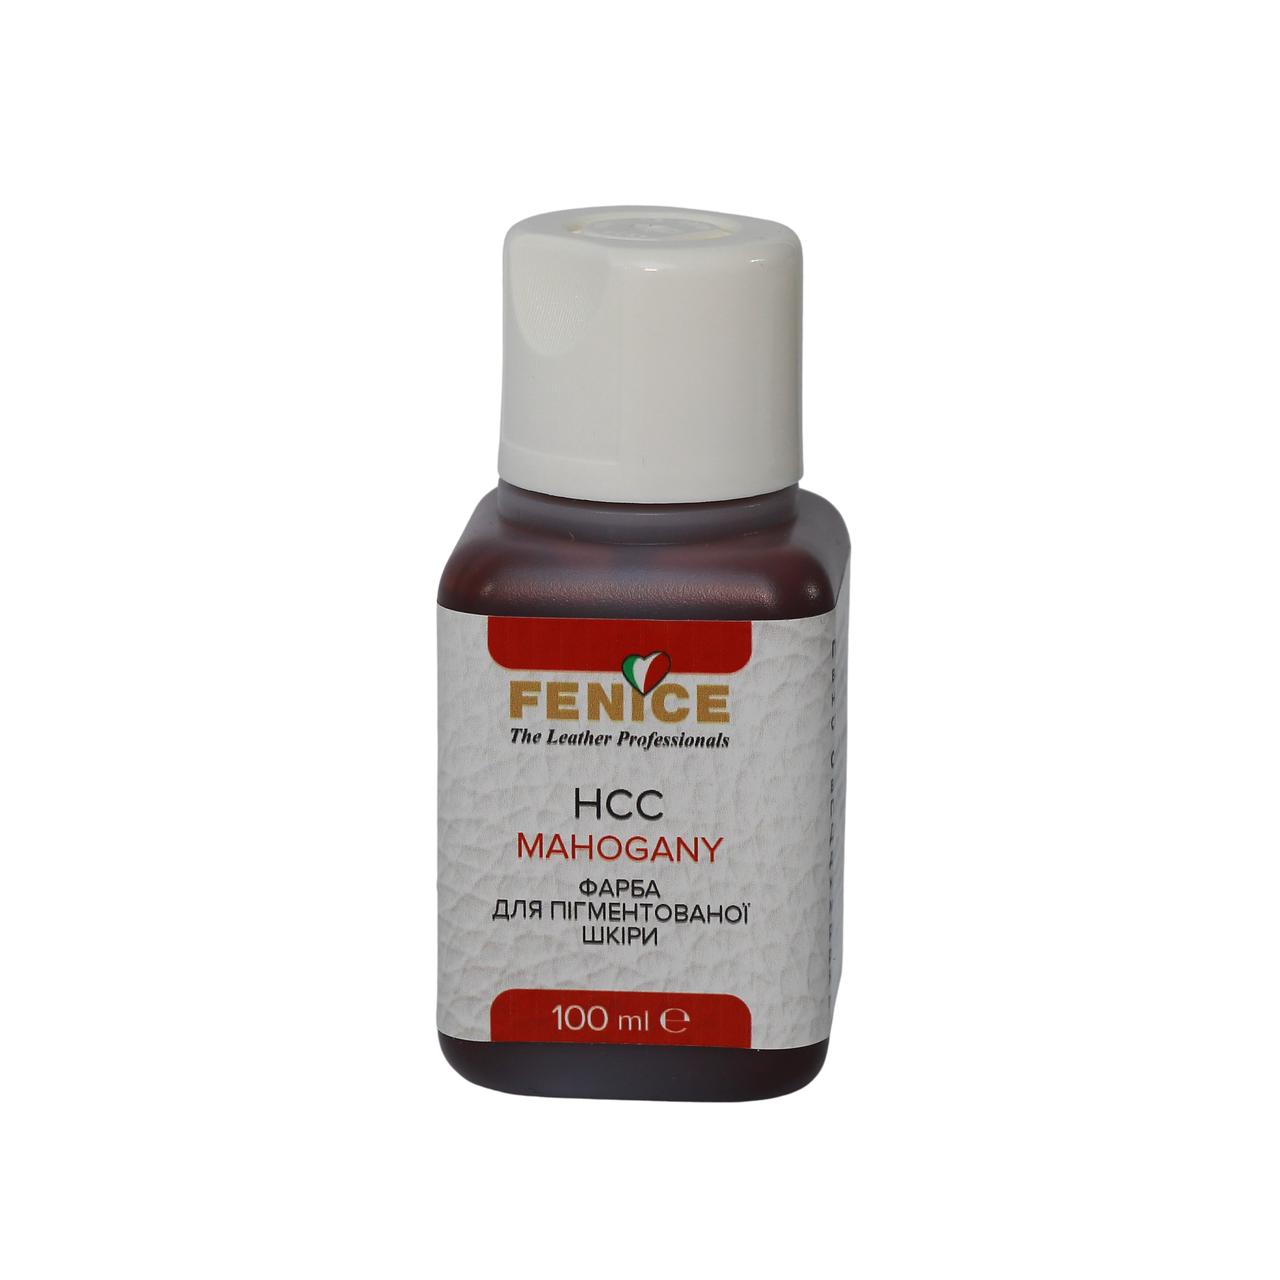 Фарба для шкіри Махонь Fenice Mahogane HCC, 100 ml